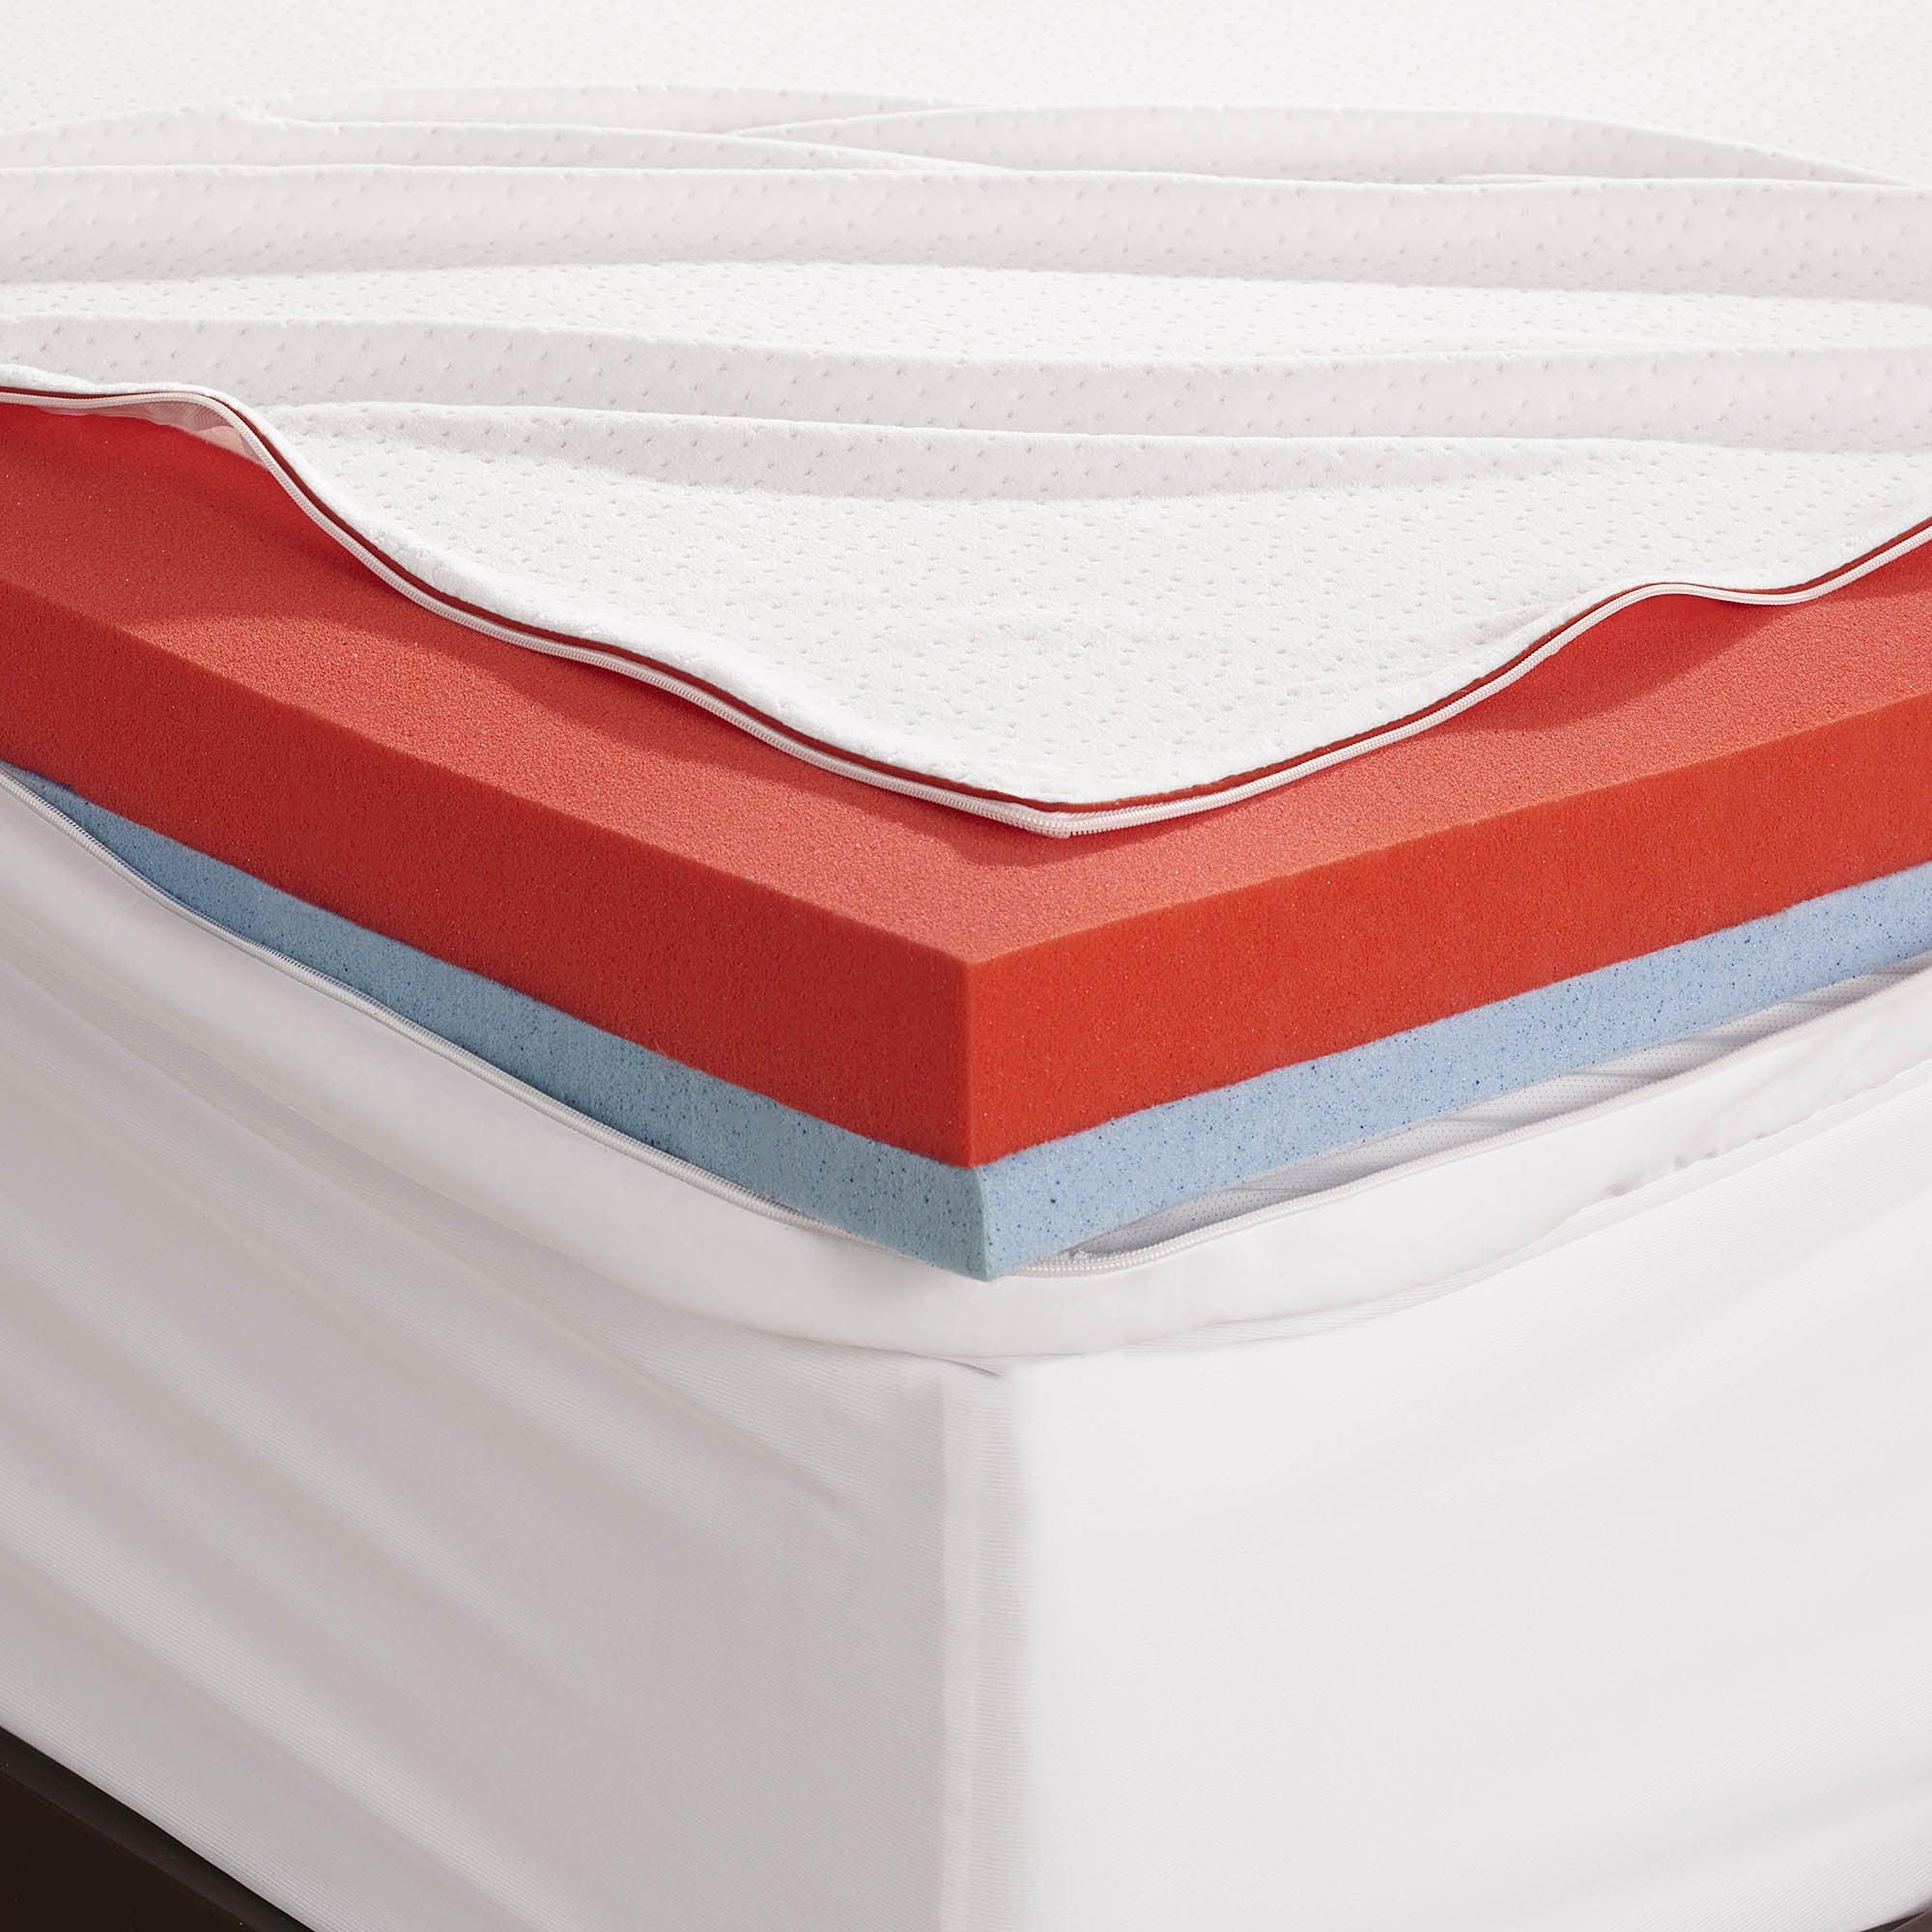 Shop Serta Seasonal 3 Inch Reversible Memory Foam Mattress Topper